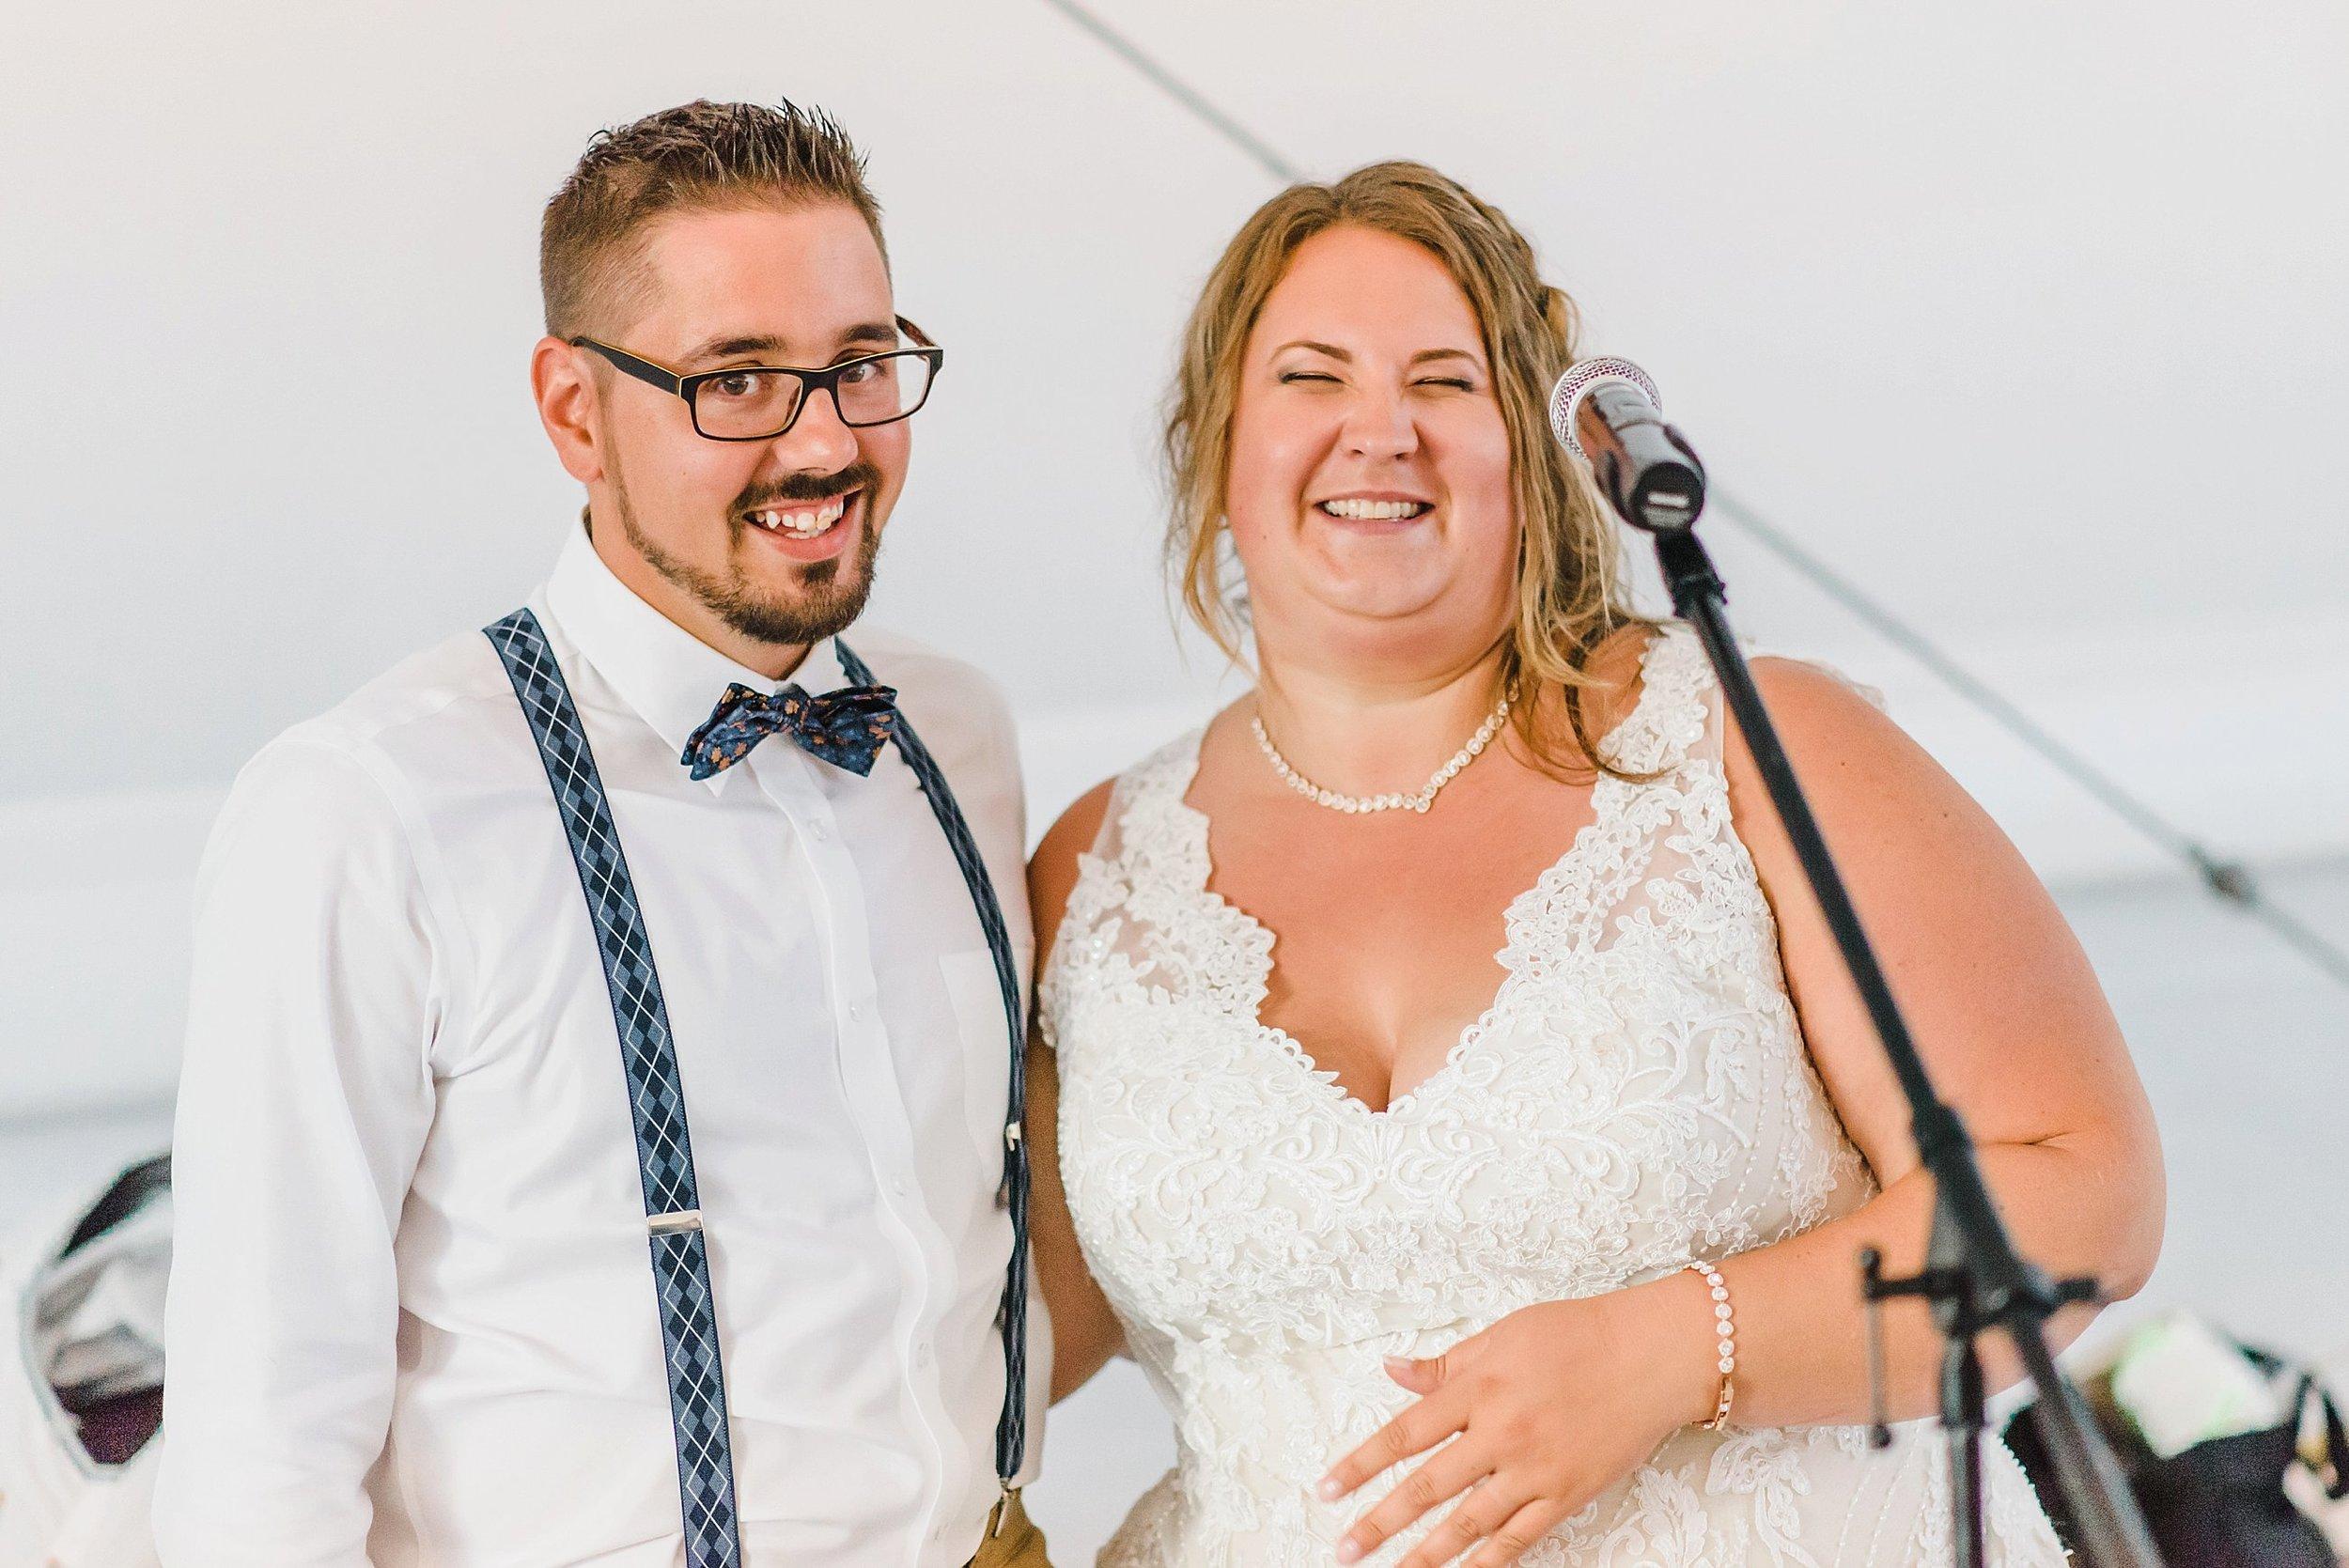 light airy indie fine art ottawa wedding photographer | Ali and Batoul Photography_0437.jpg